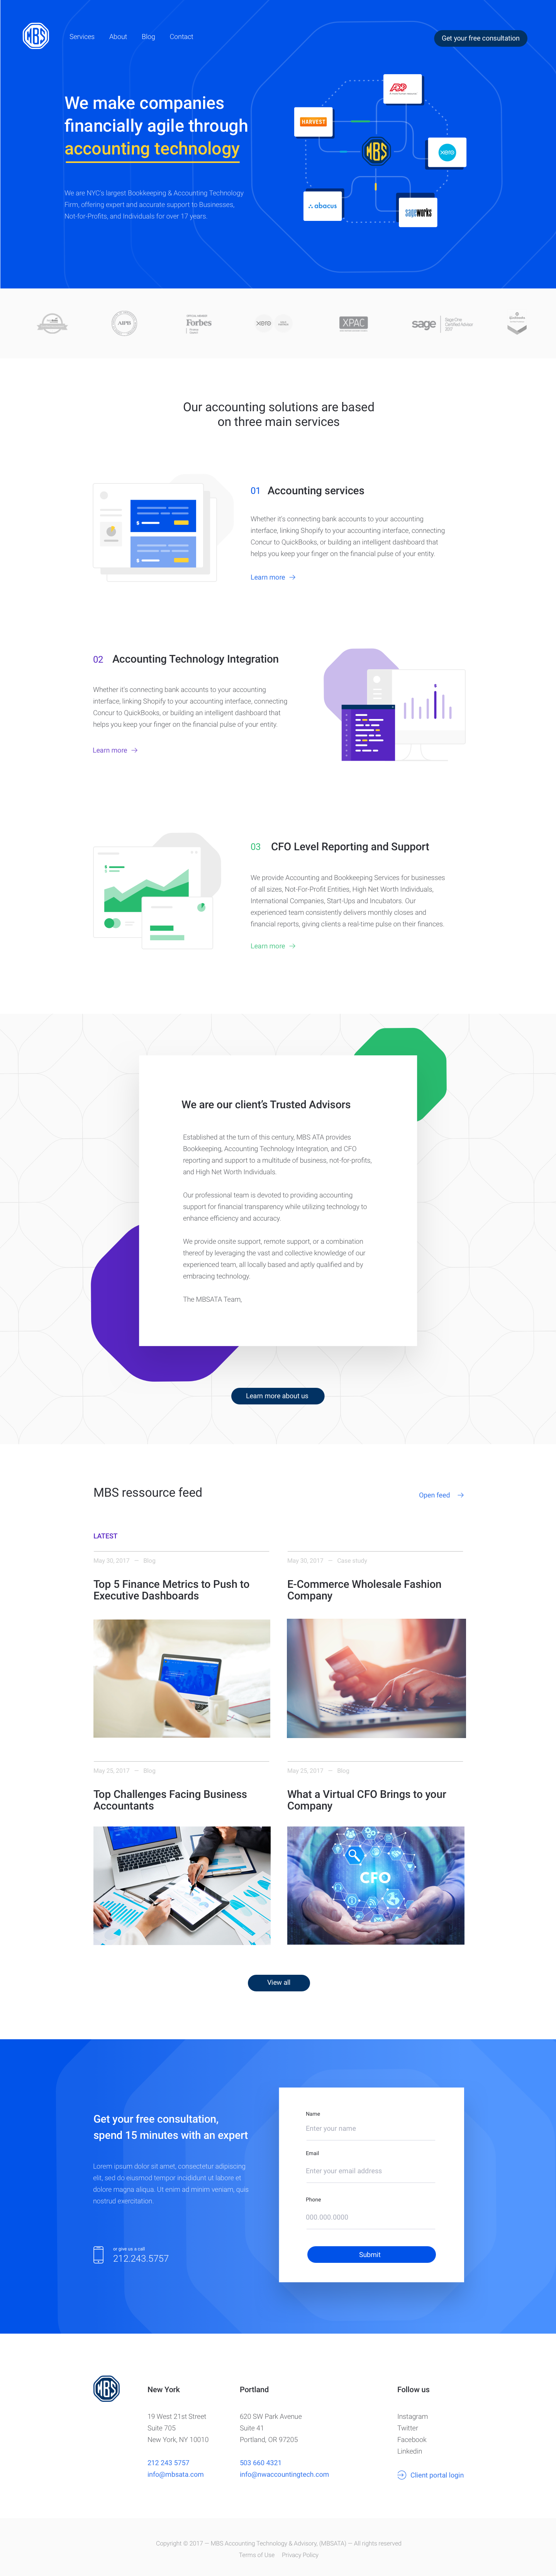 Homepage redesign mockup